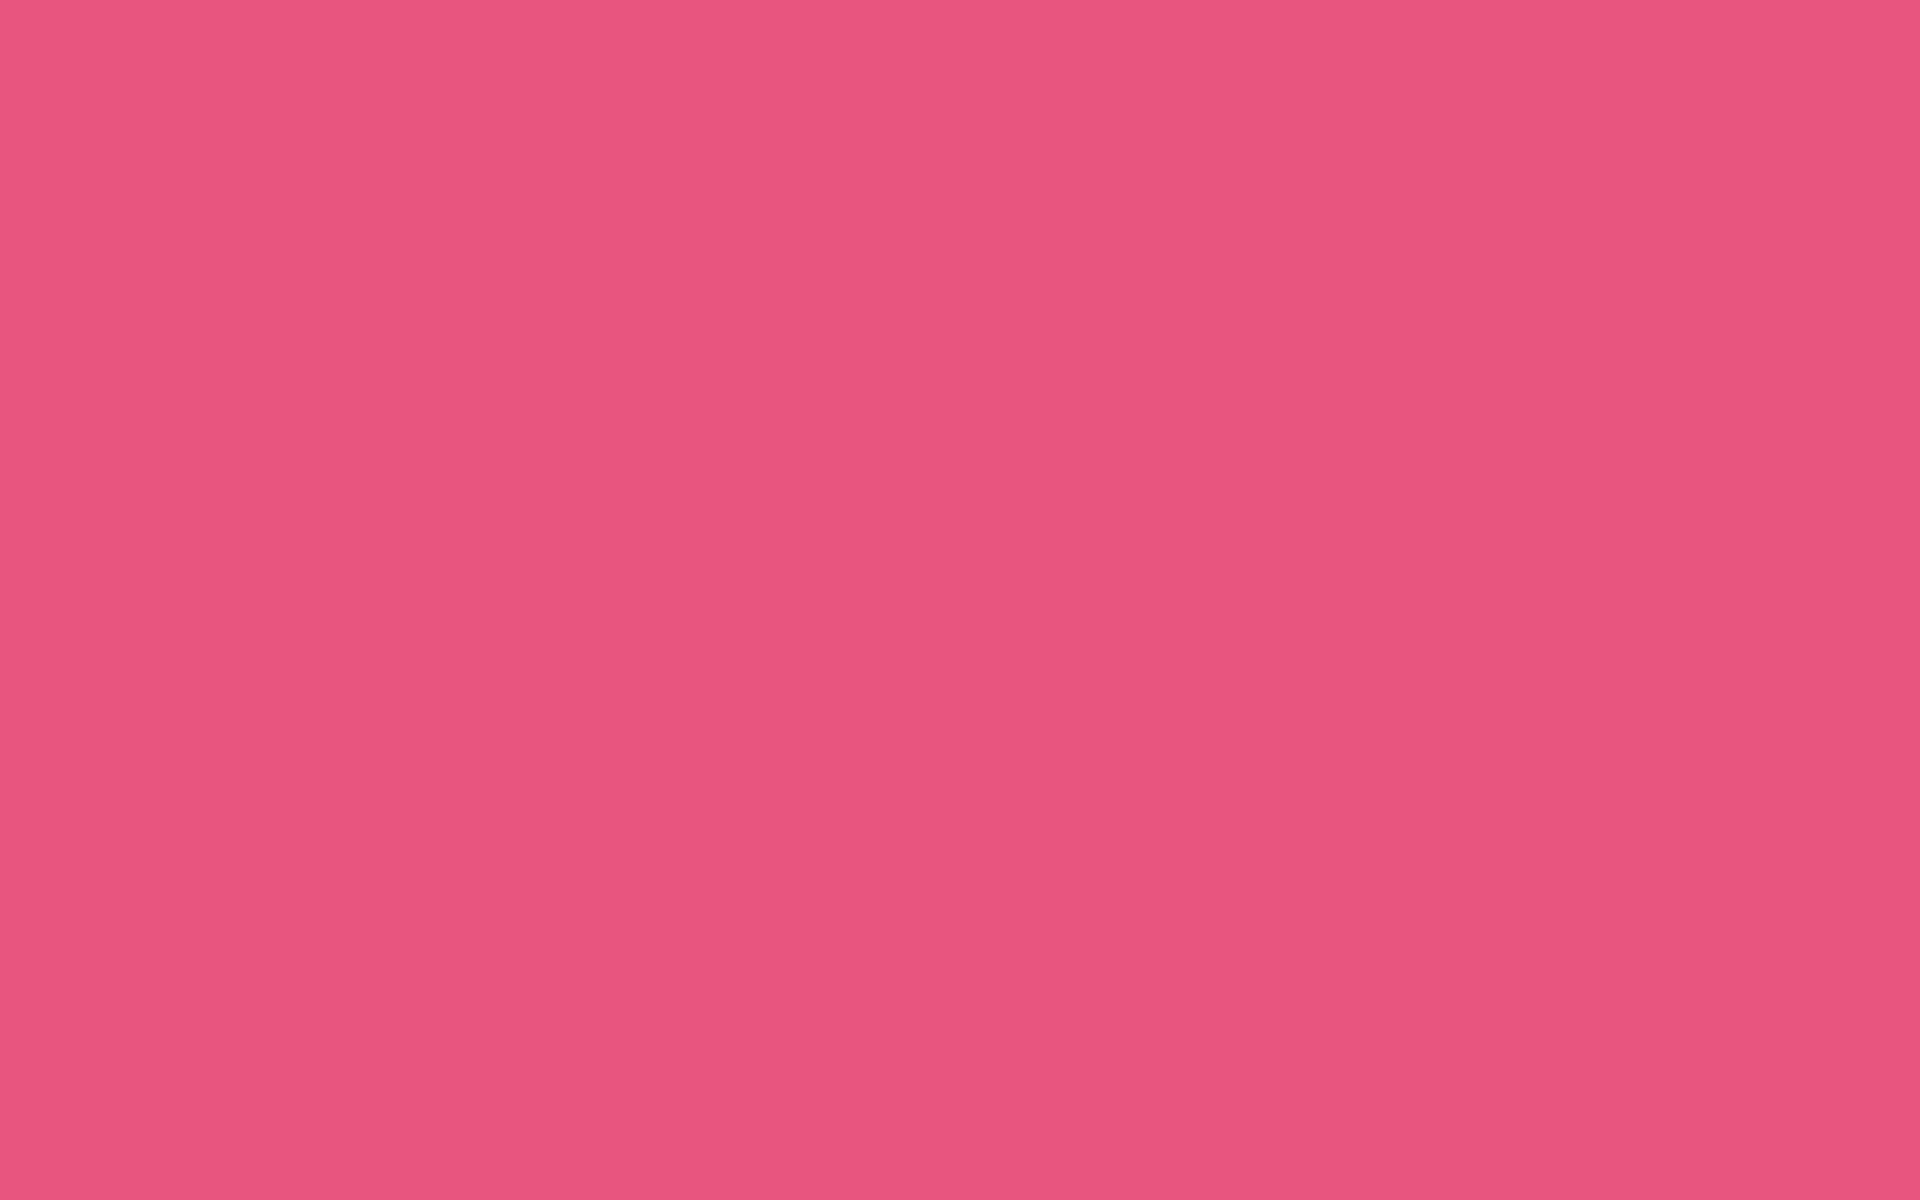 1920x1200 Dark Pink Solid Color Background